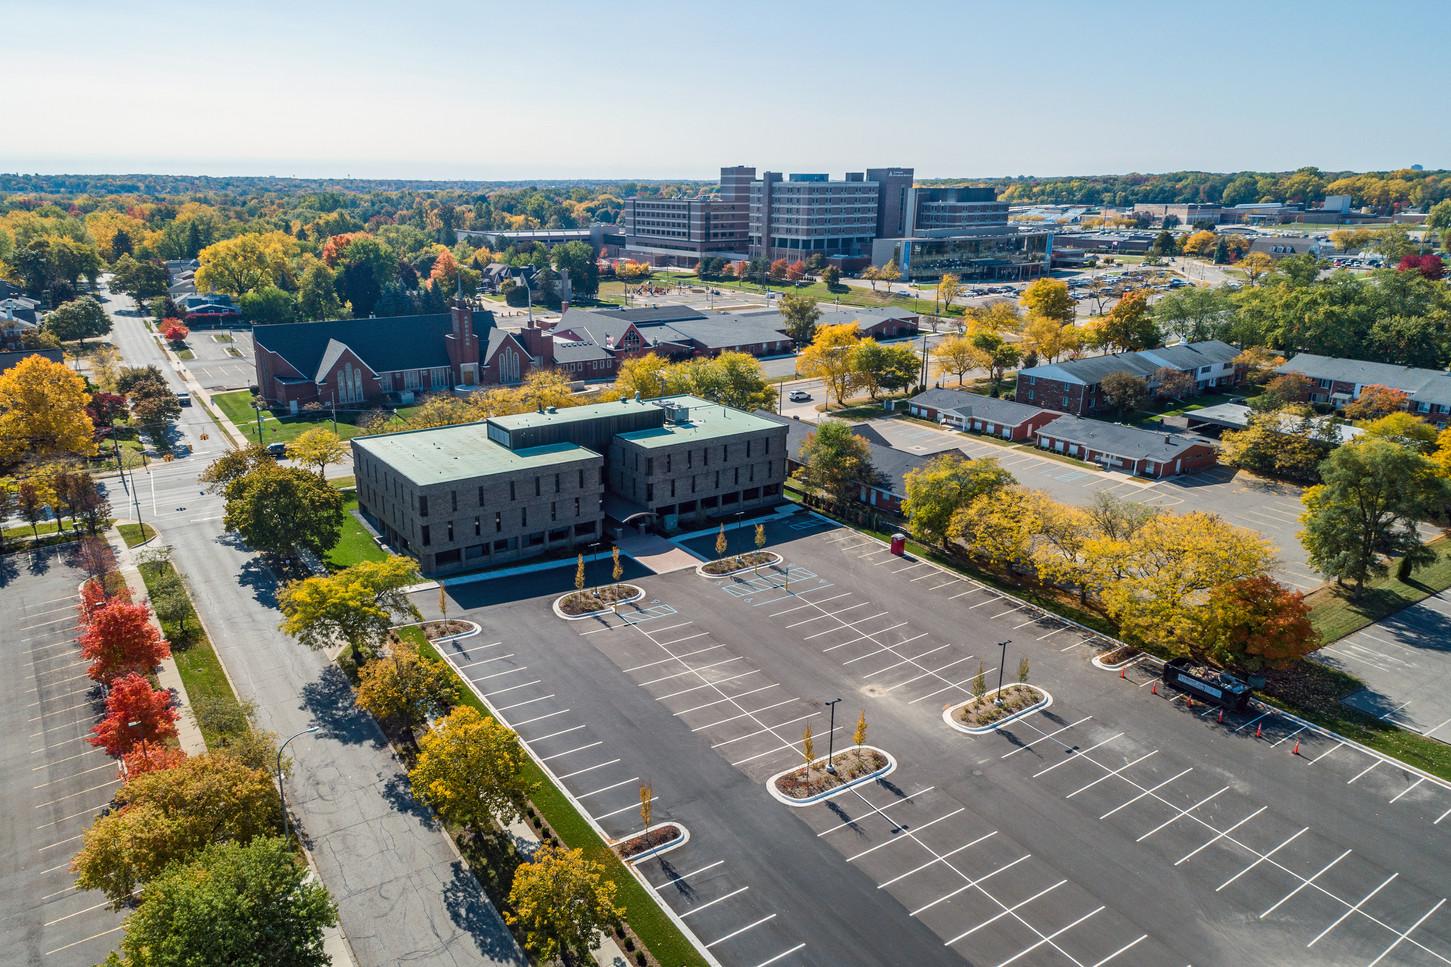 University Trails Medical - For Lease